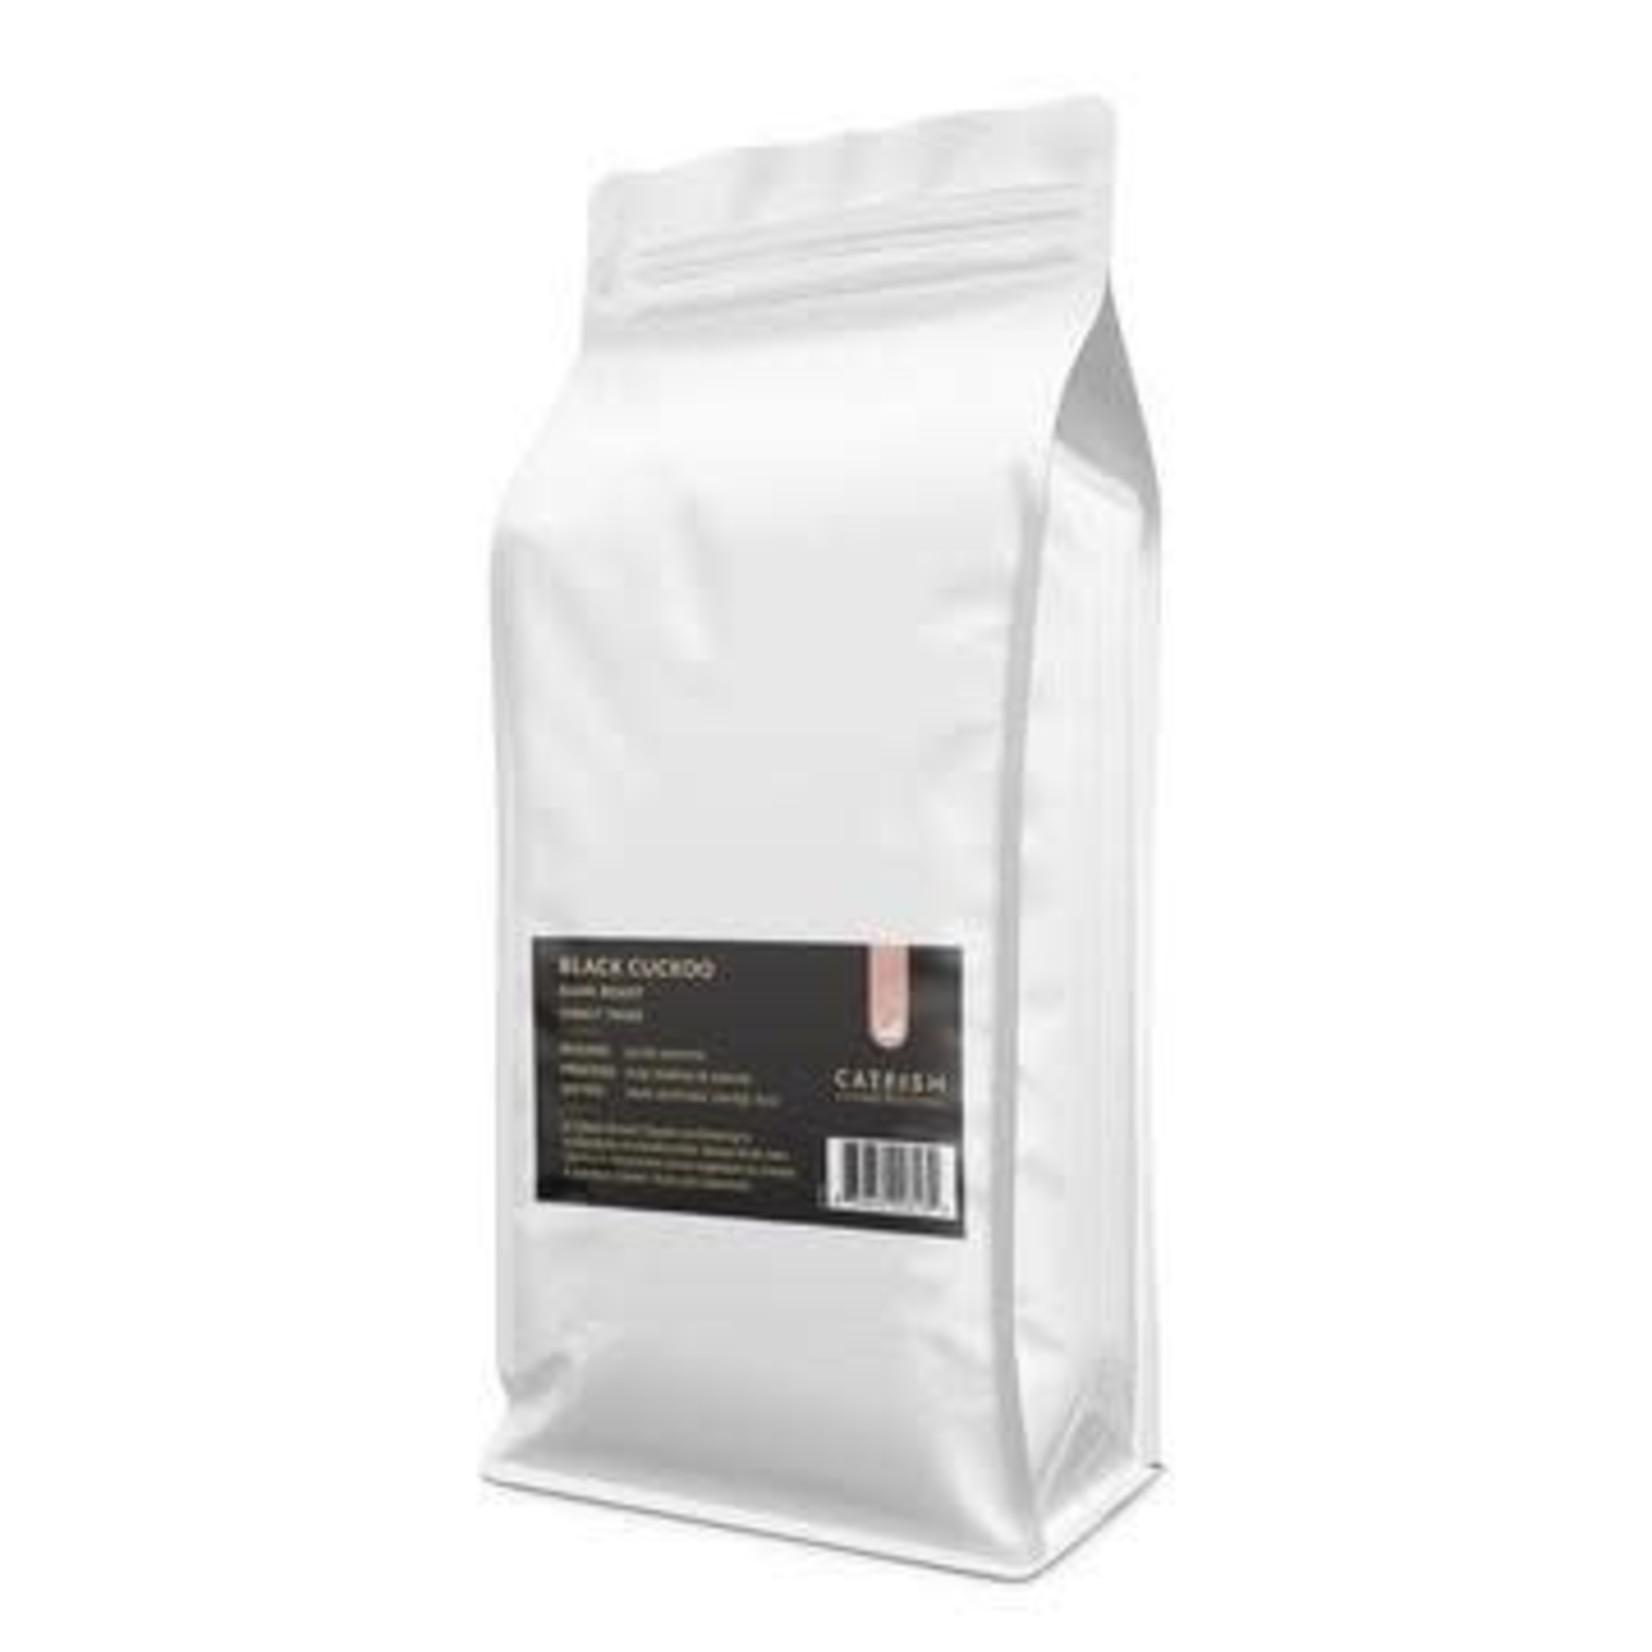 CATFISH COFFEE BLACK CUCKOO (Dark Roast)